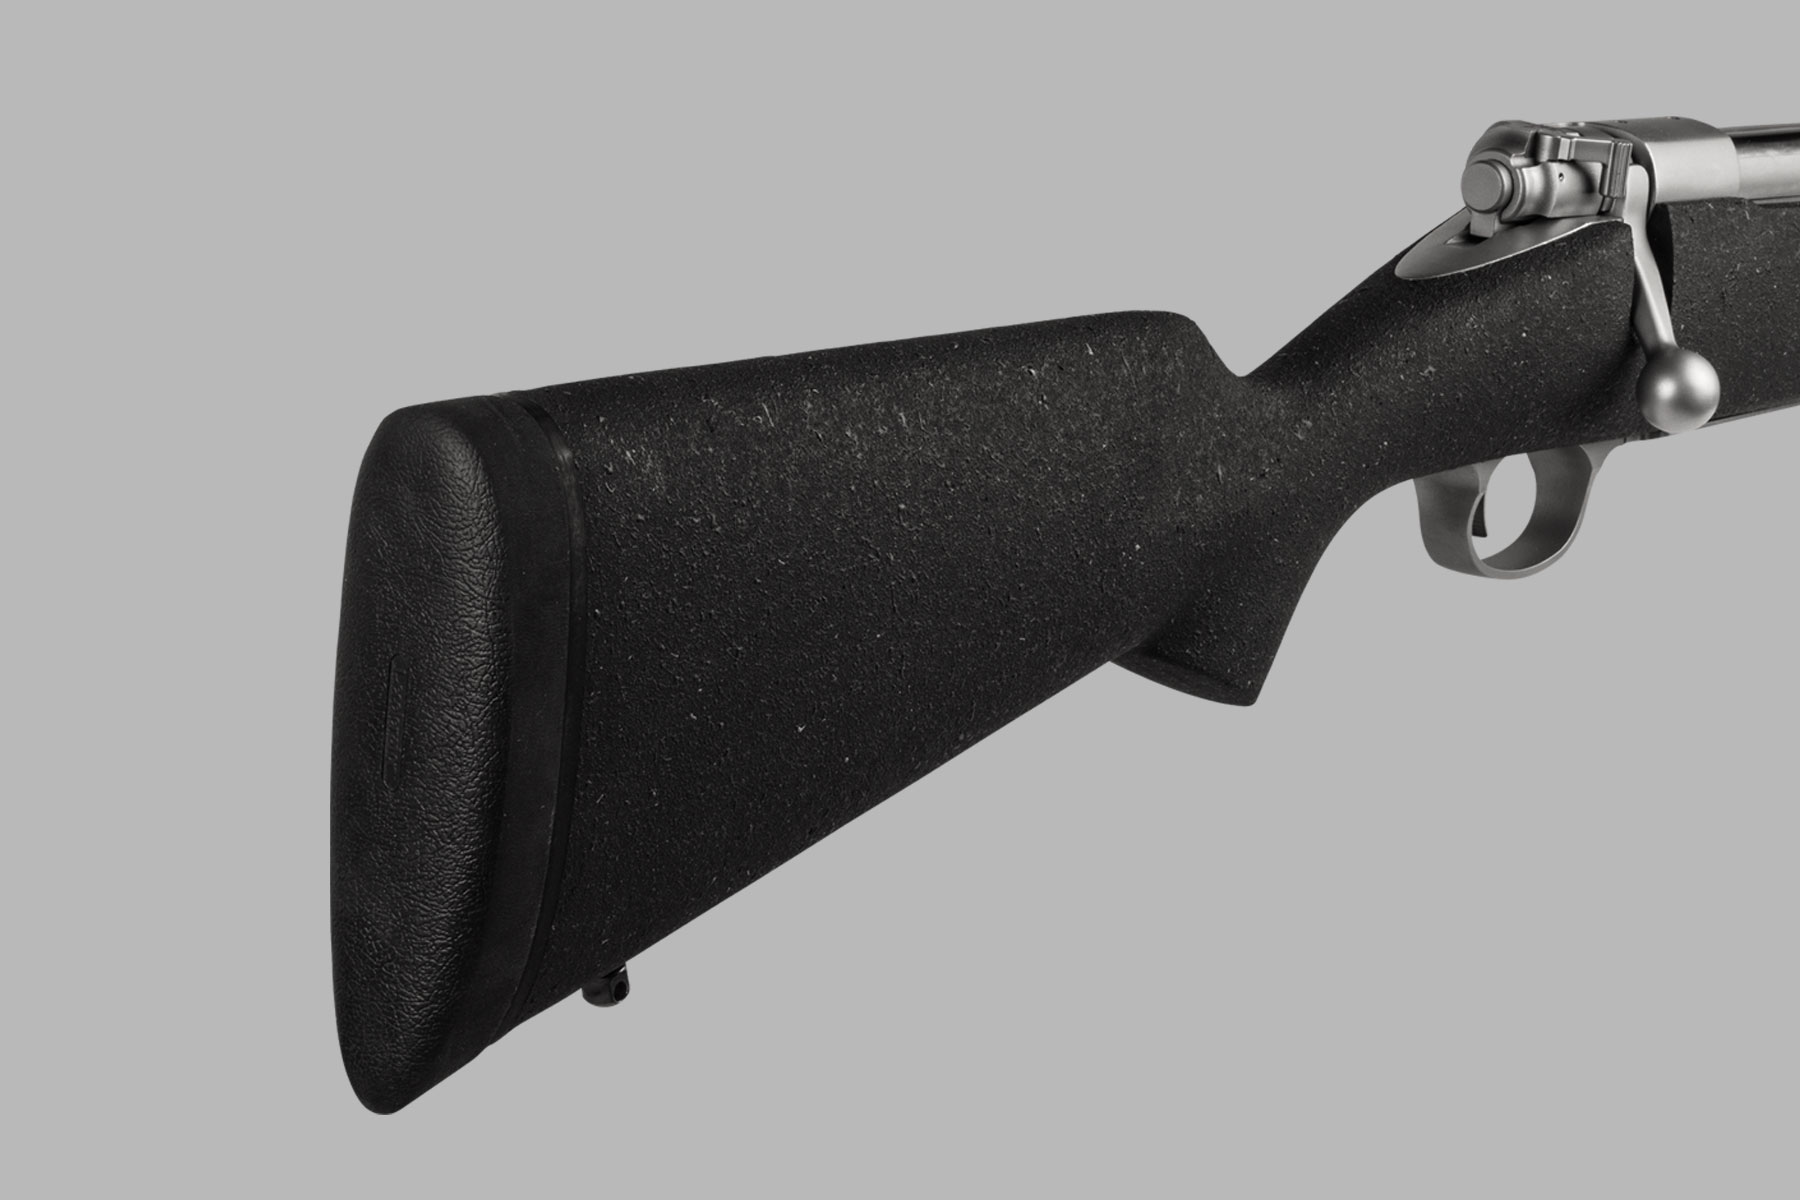 montana-rifle-03.jpg